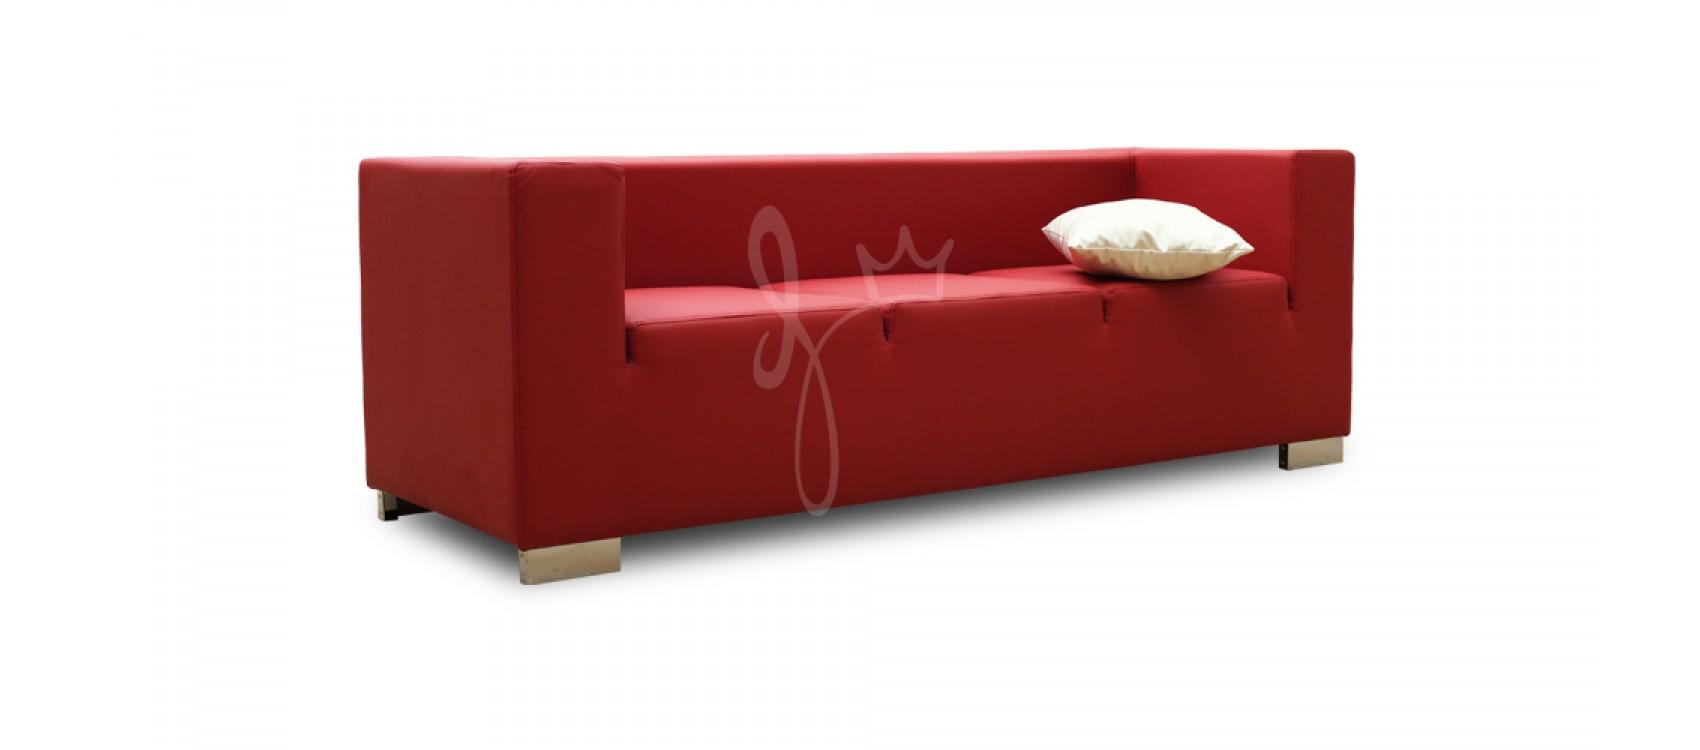 Sofa PYRAMID foto 2